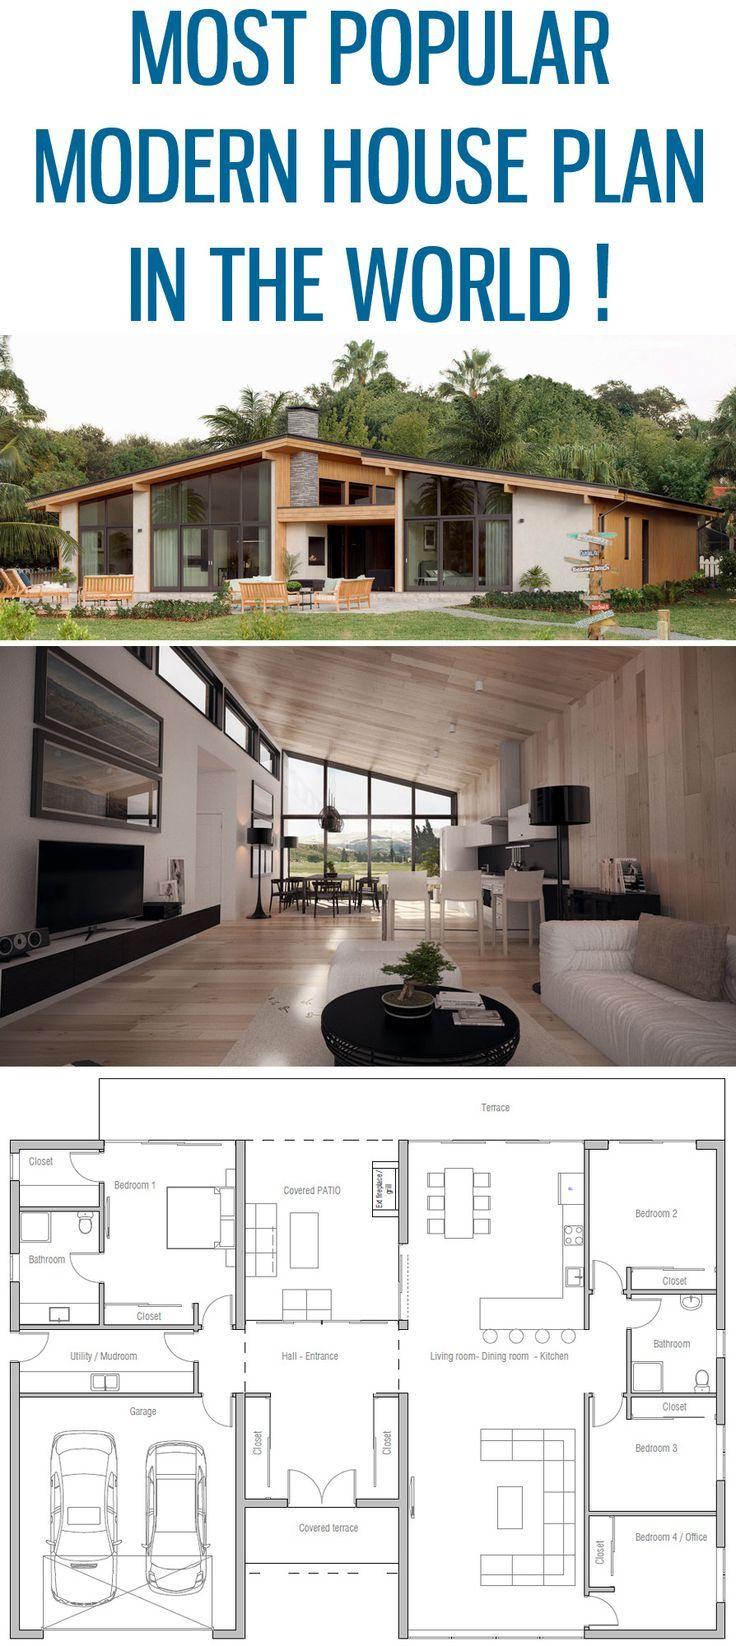 Plans Maison En Photos 2018 Image Description Most Popular Modern House Plan Home Plan Floor Plan Hou House Plans Modern House Plan Modern House Plans